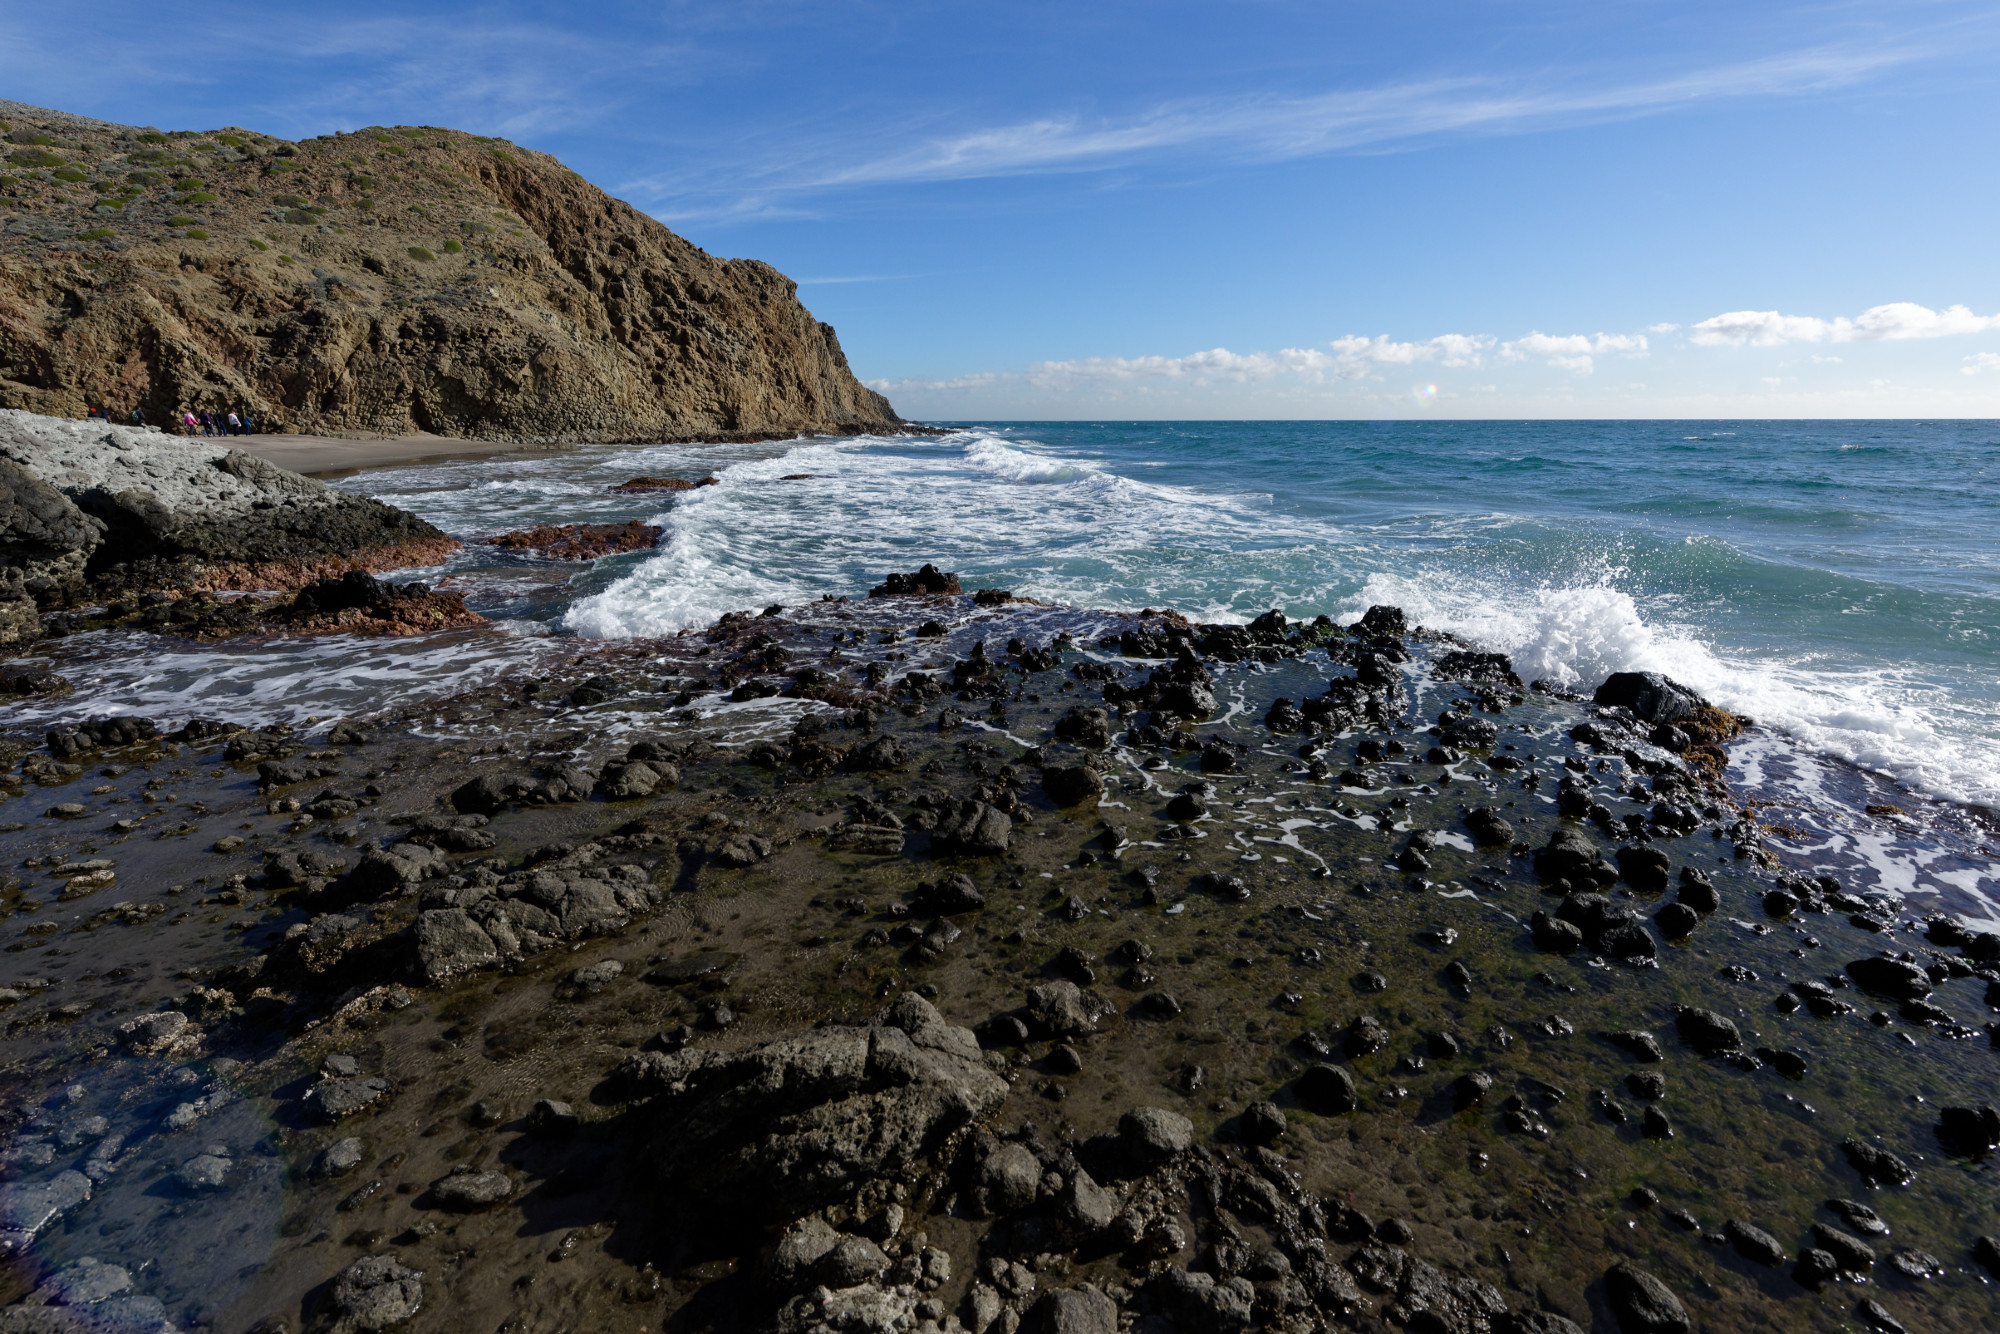 171214-San Jose-Playa del Monsul (Cabo de Gata-Andalousie) (169)